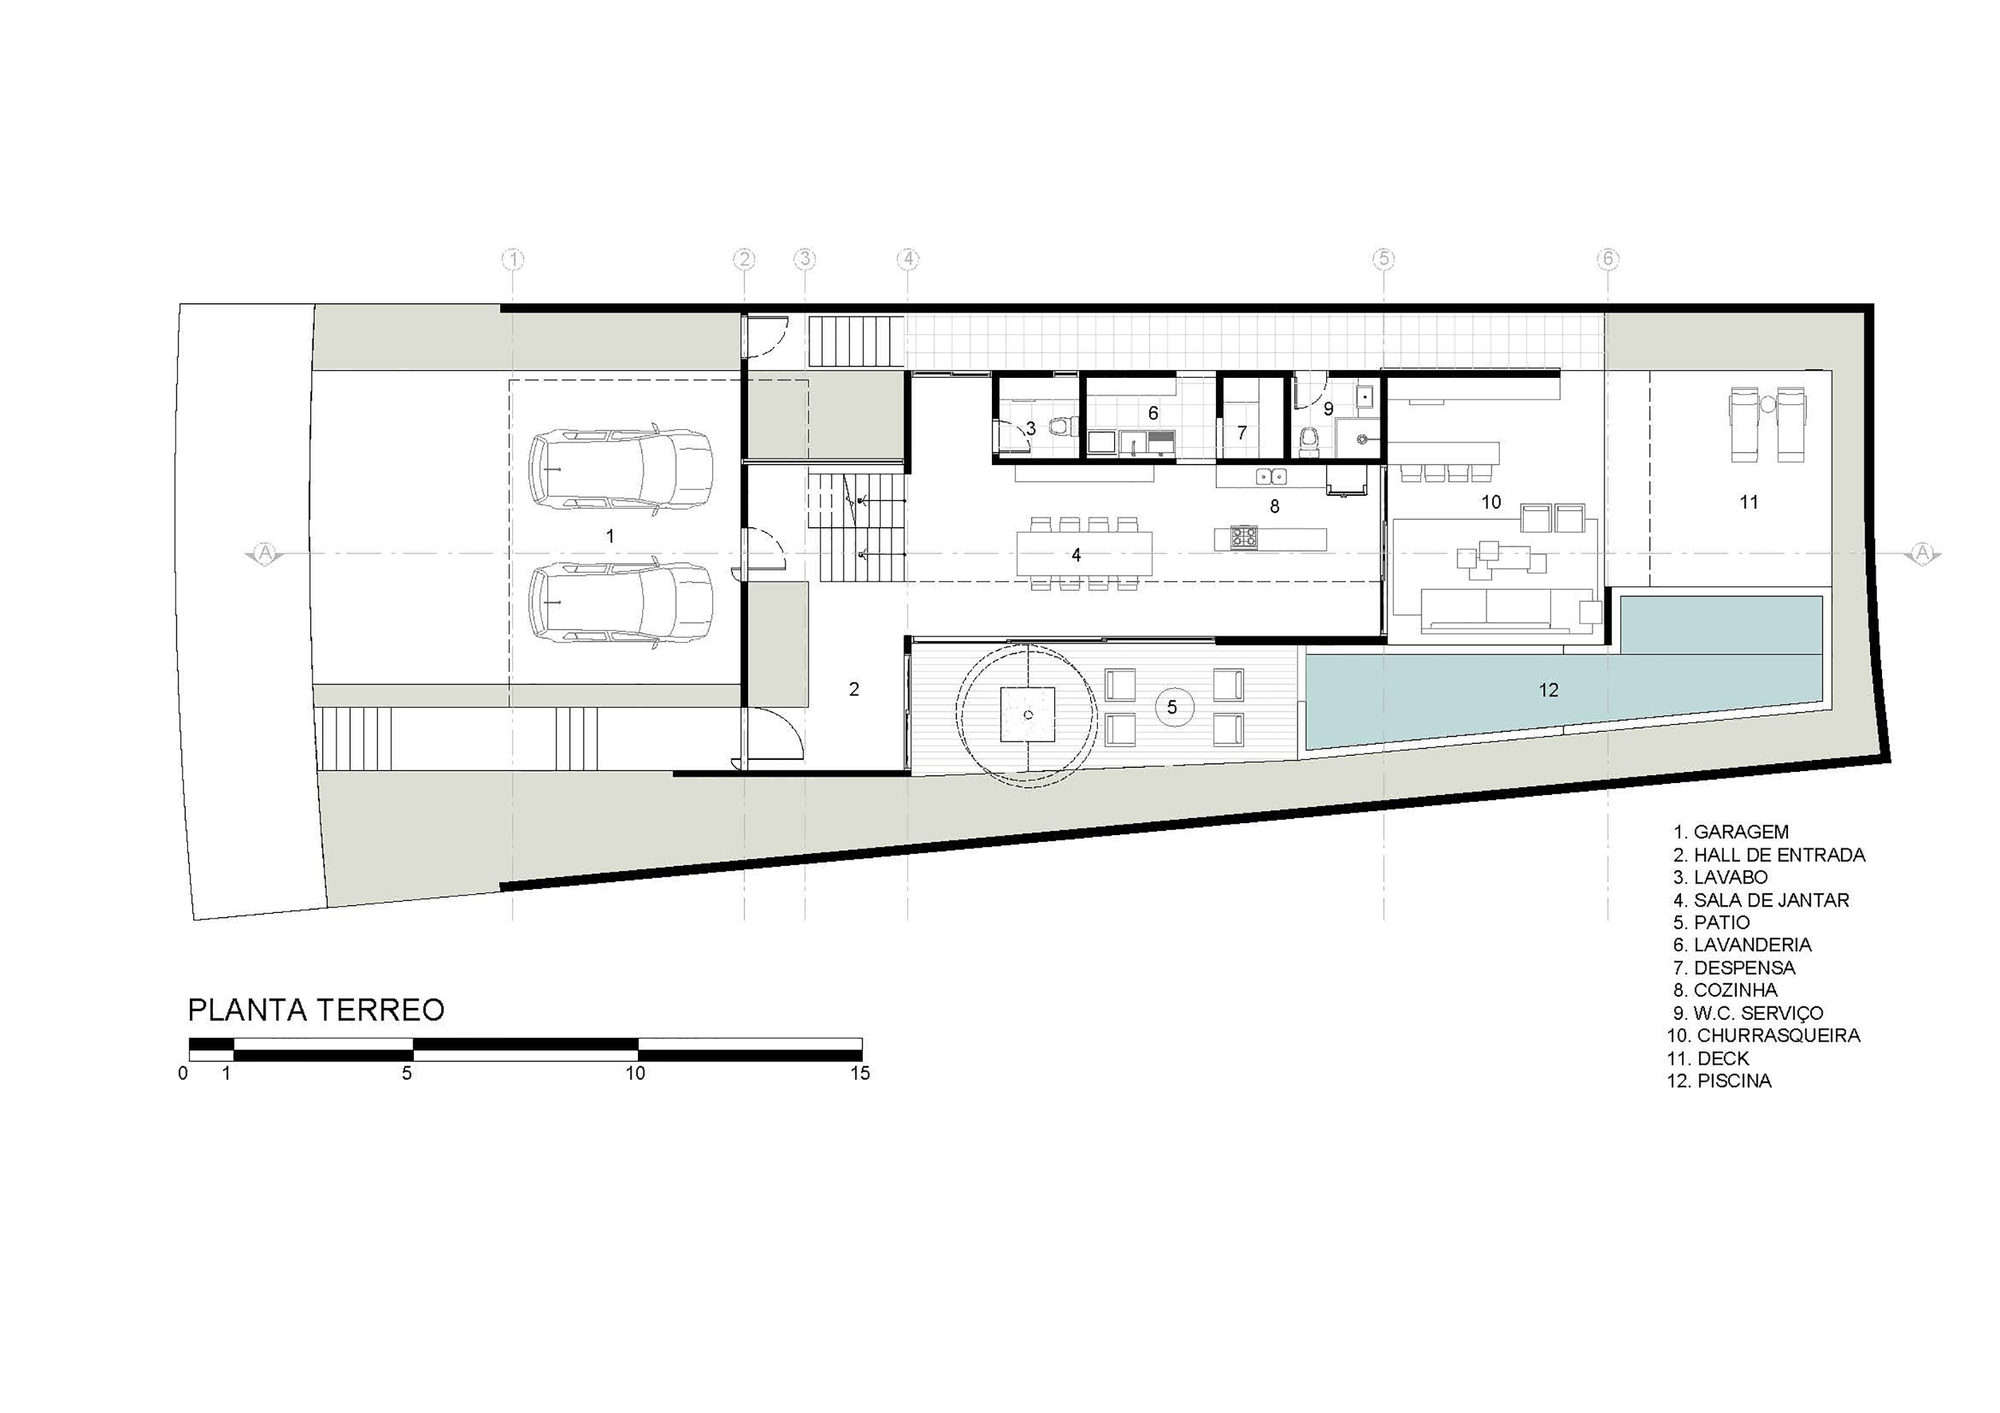 Architecture guaiume house 24 7 arquitetura design for Home design 7